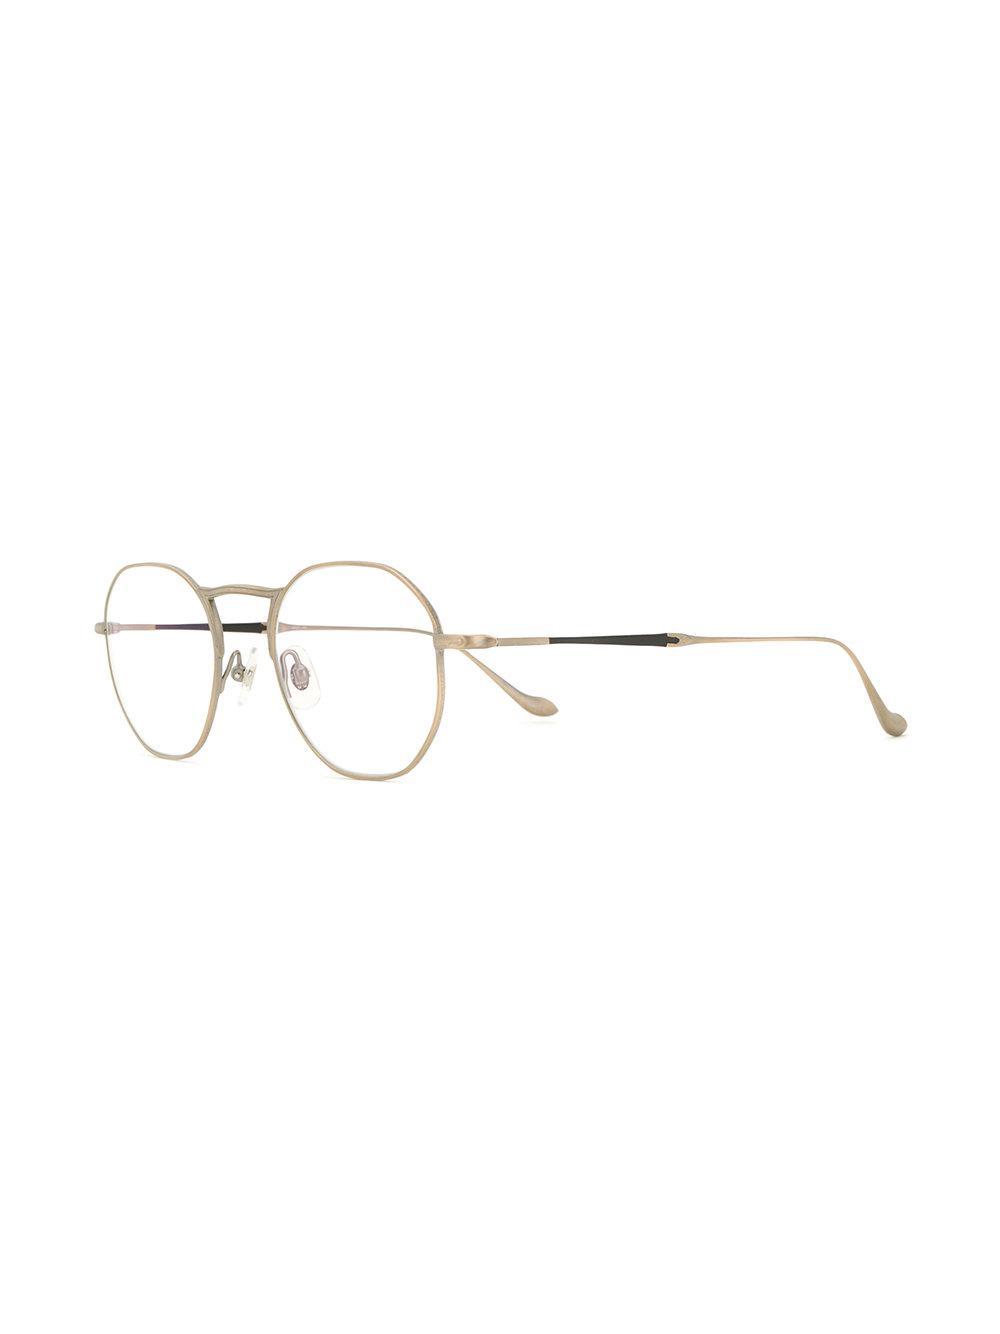 classic round glasses - Metallic Matsuda mxS1HyjCuK